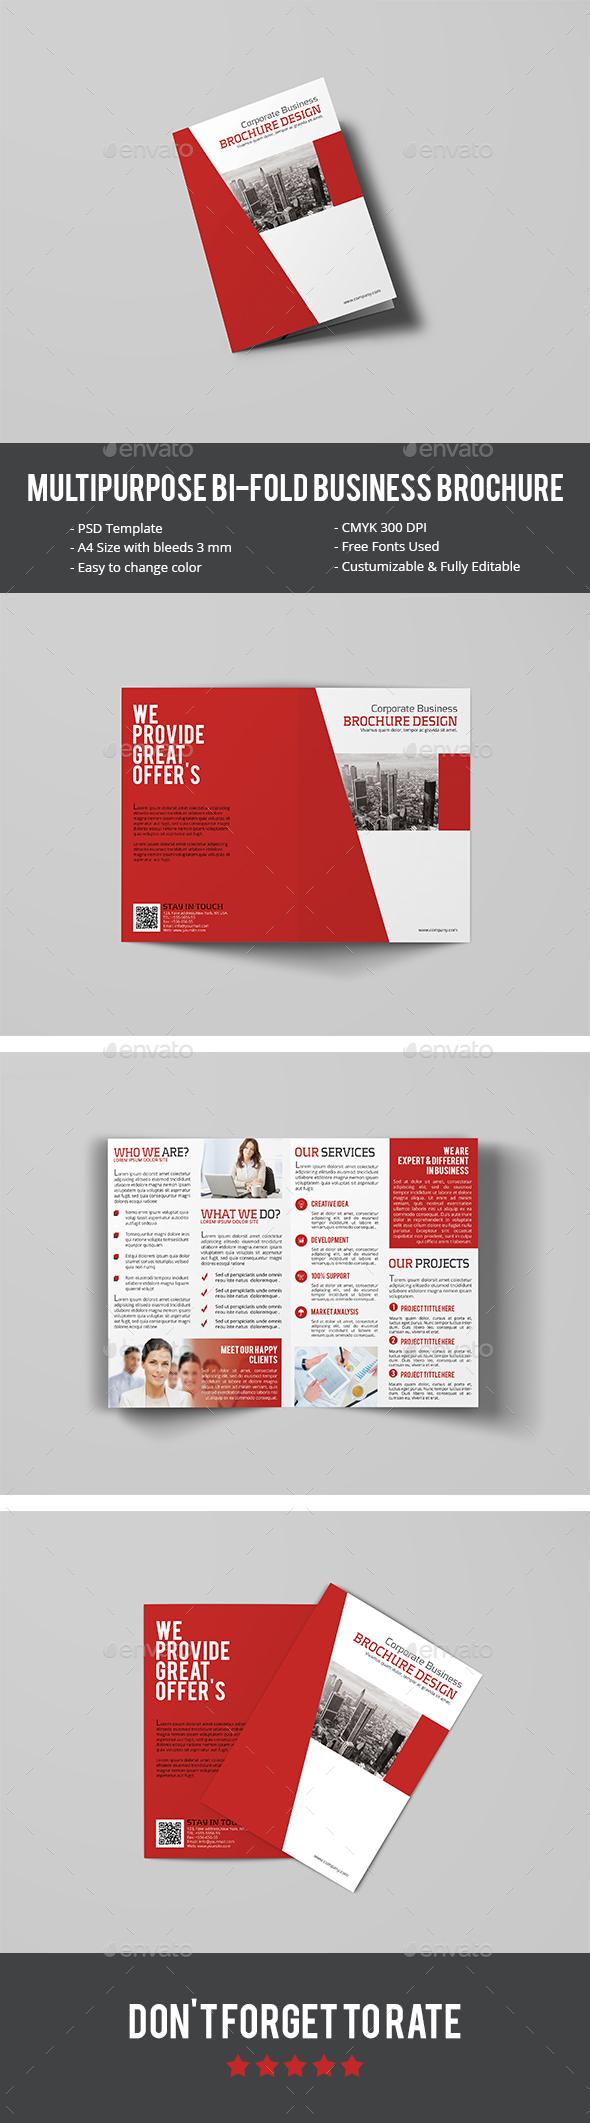 Multipurpose Bi-Fold Business Brochure - Corporate Brochures